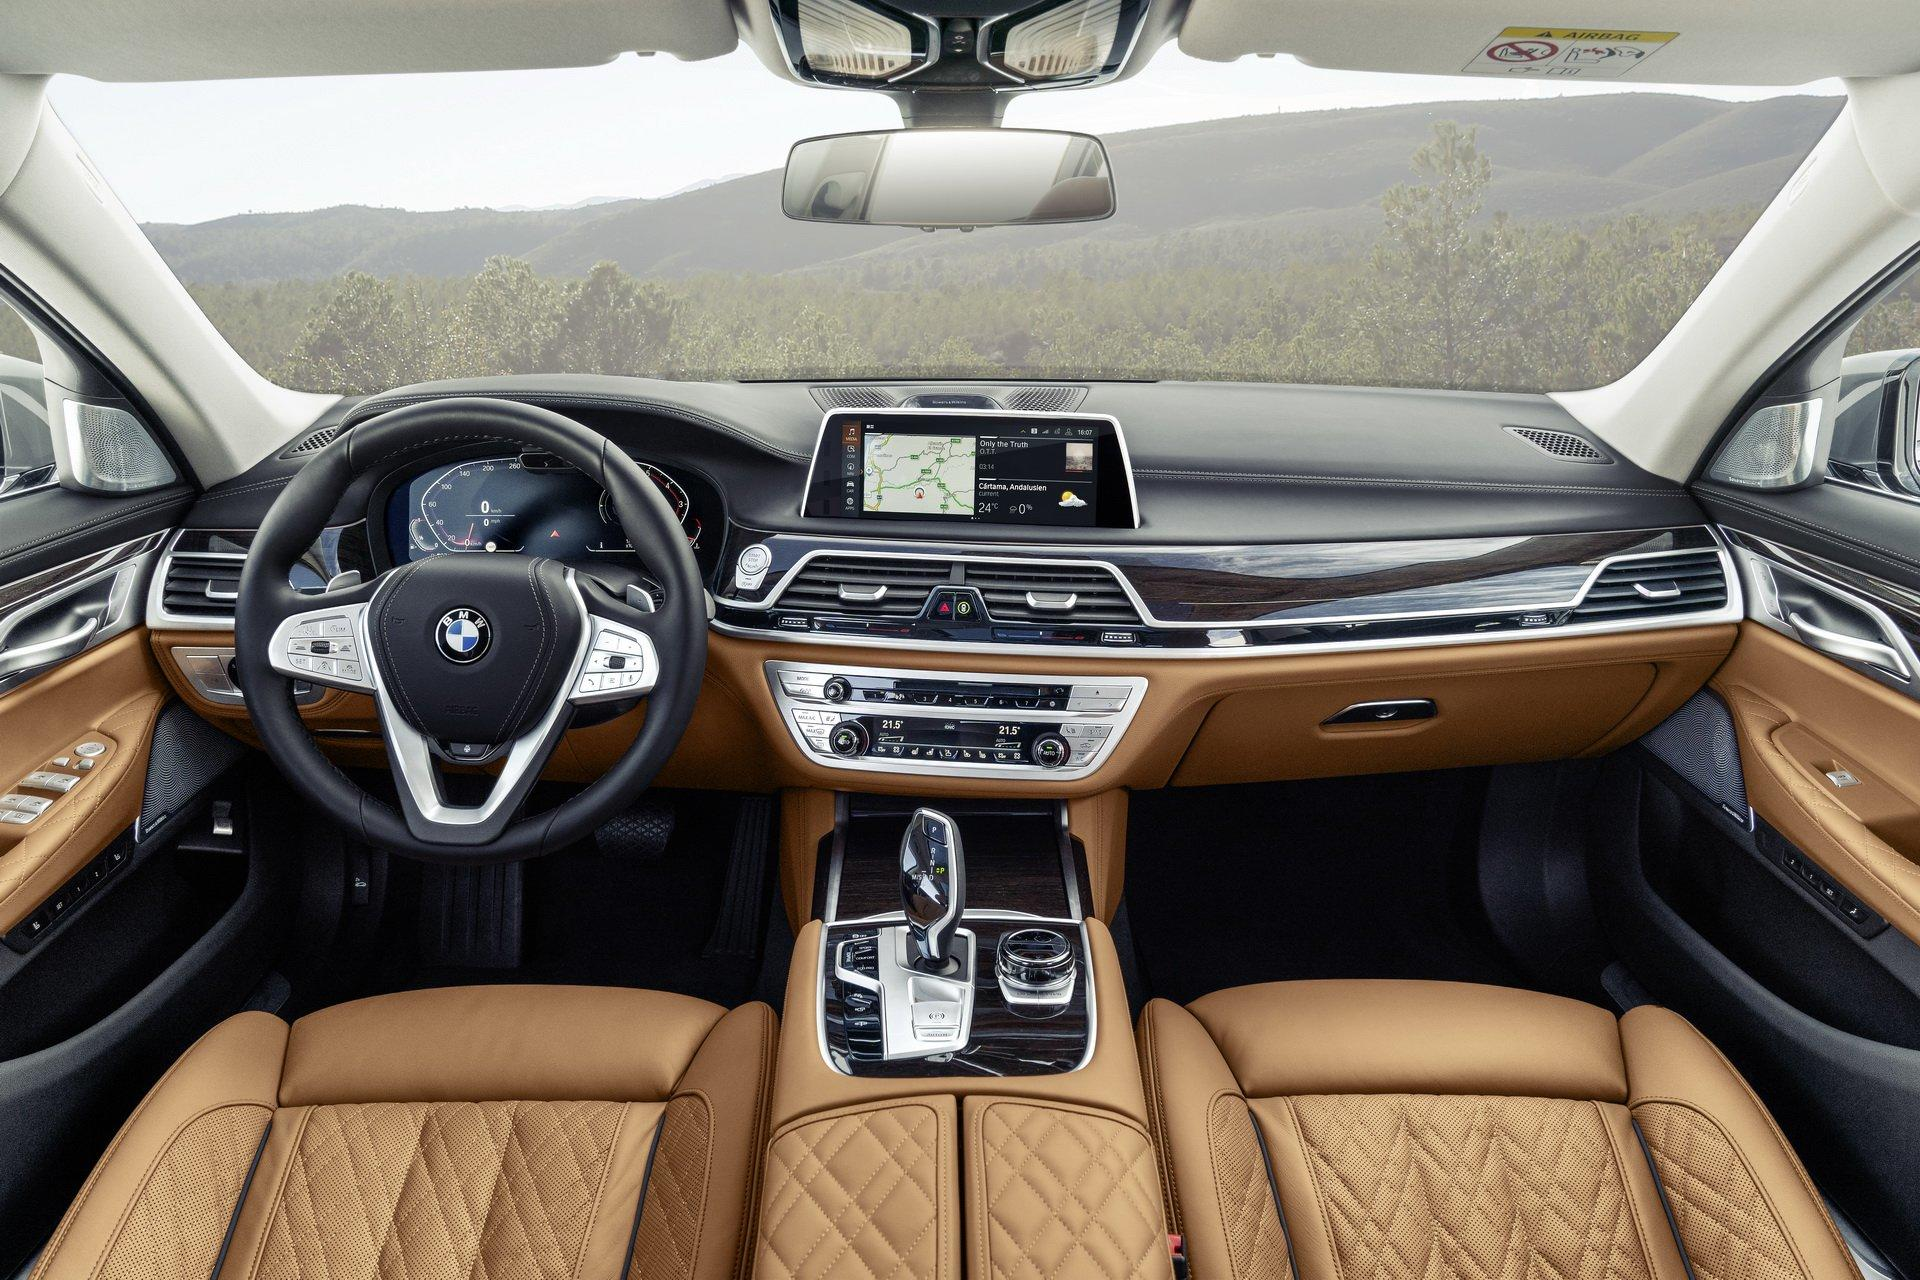 2020-G11-G12-BMW-7-Series-Facelift-Interior